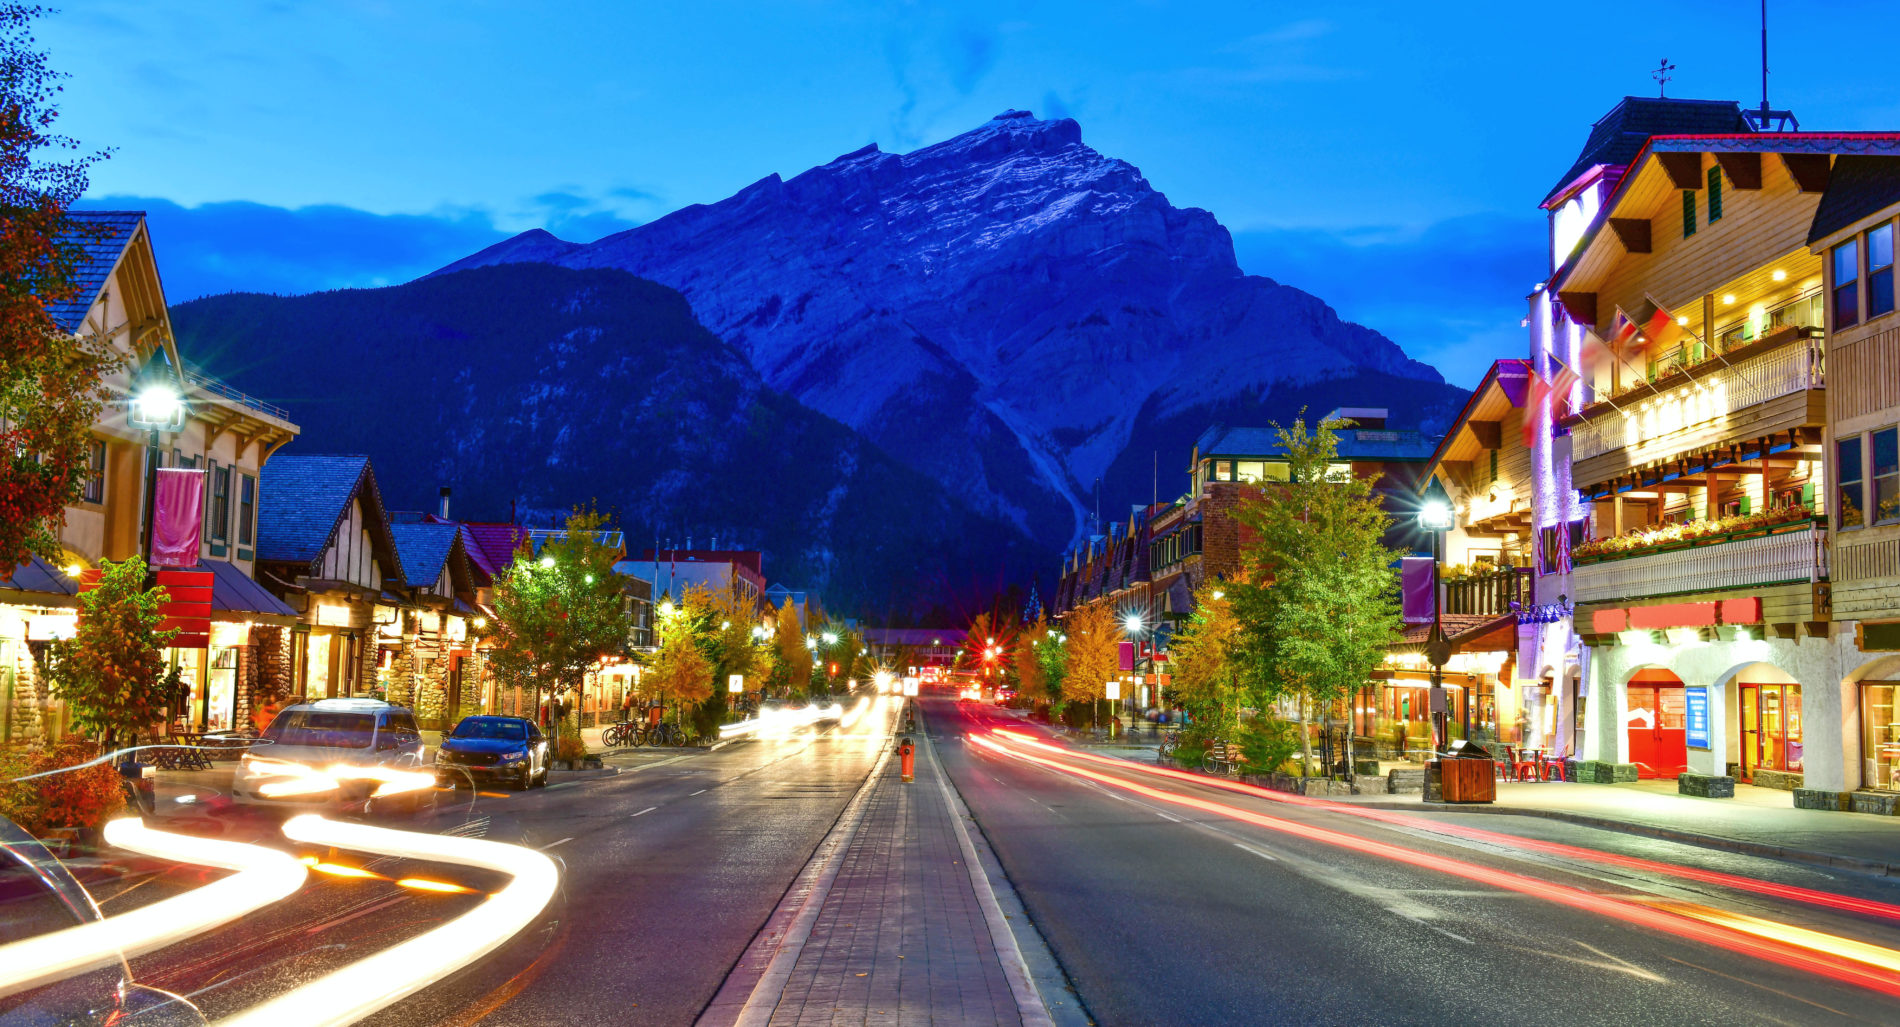 Banff Avenue at dusk